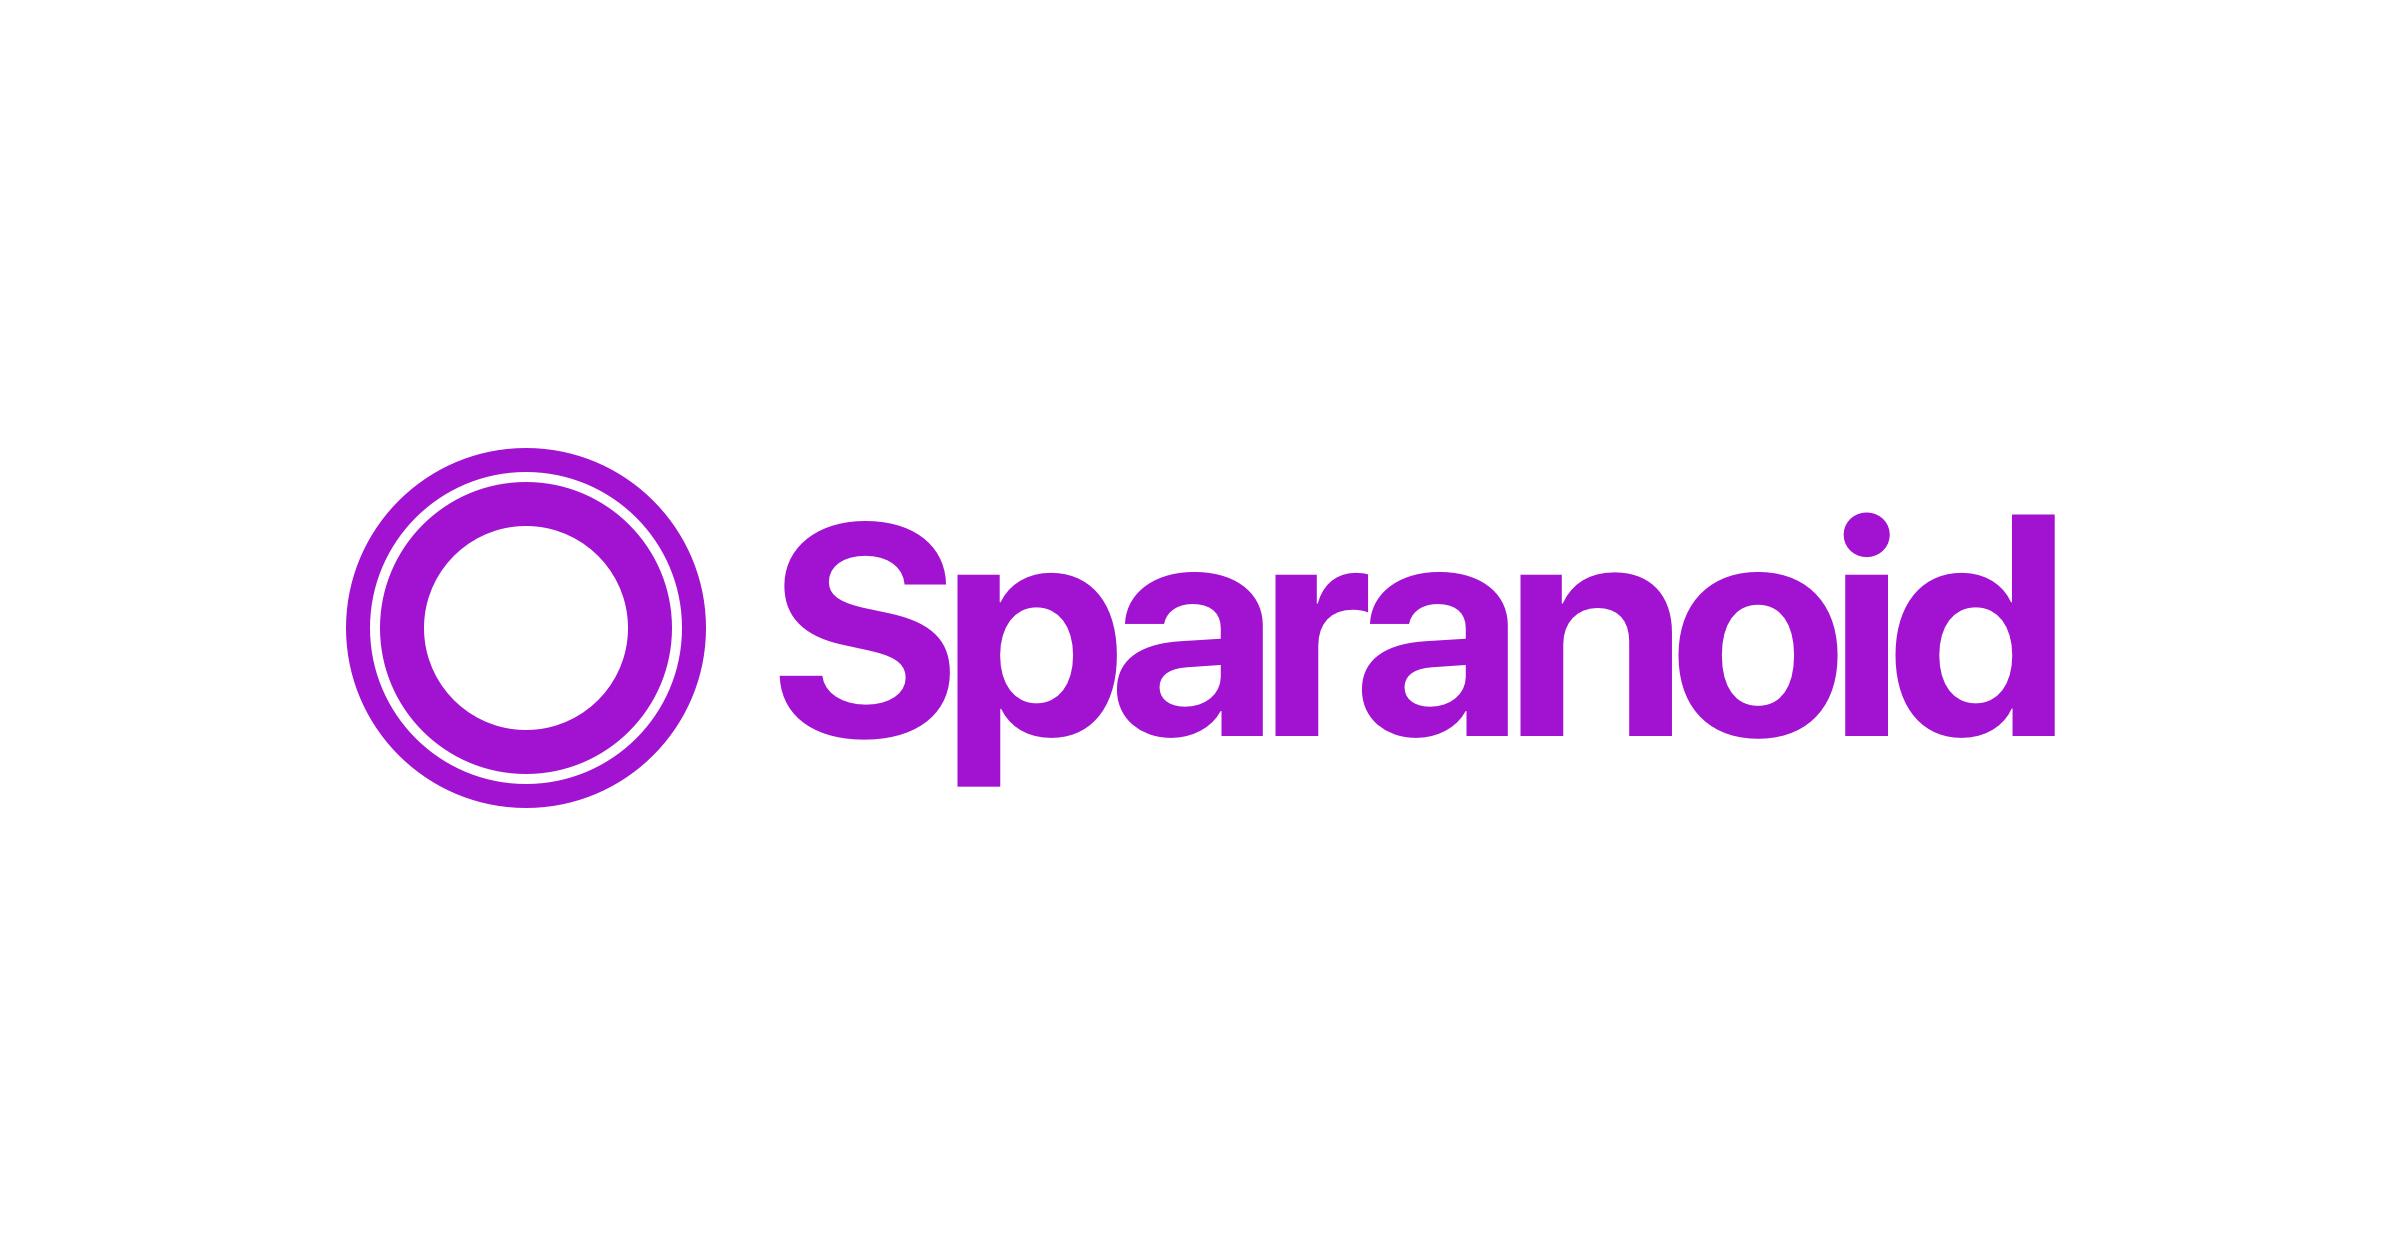 Public Key Pinning / HPKP Reporting - Sparanoid